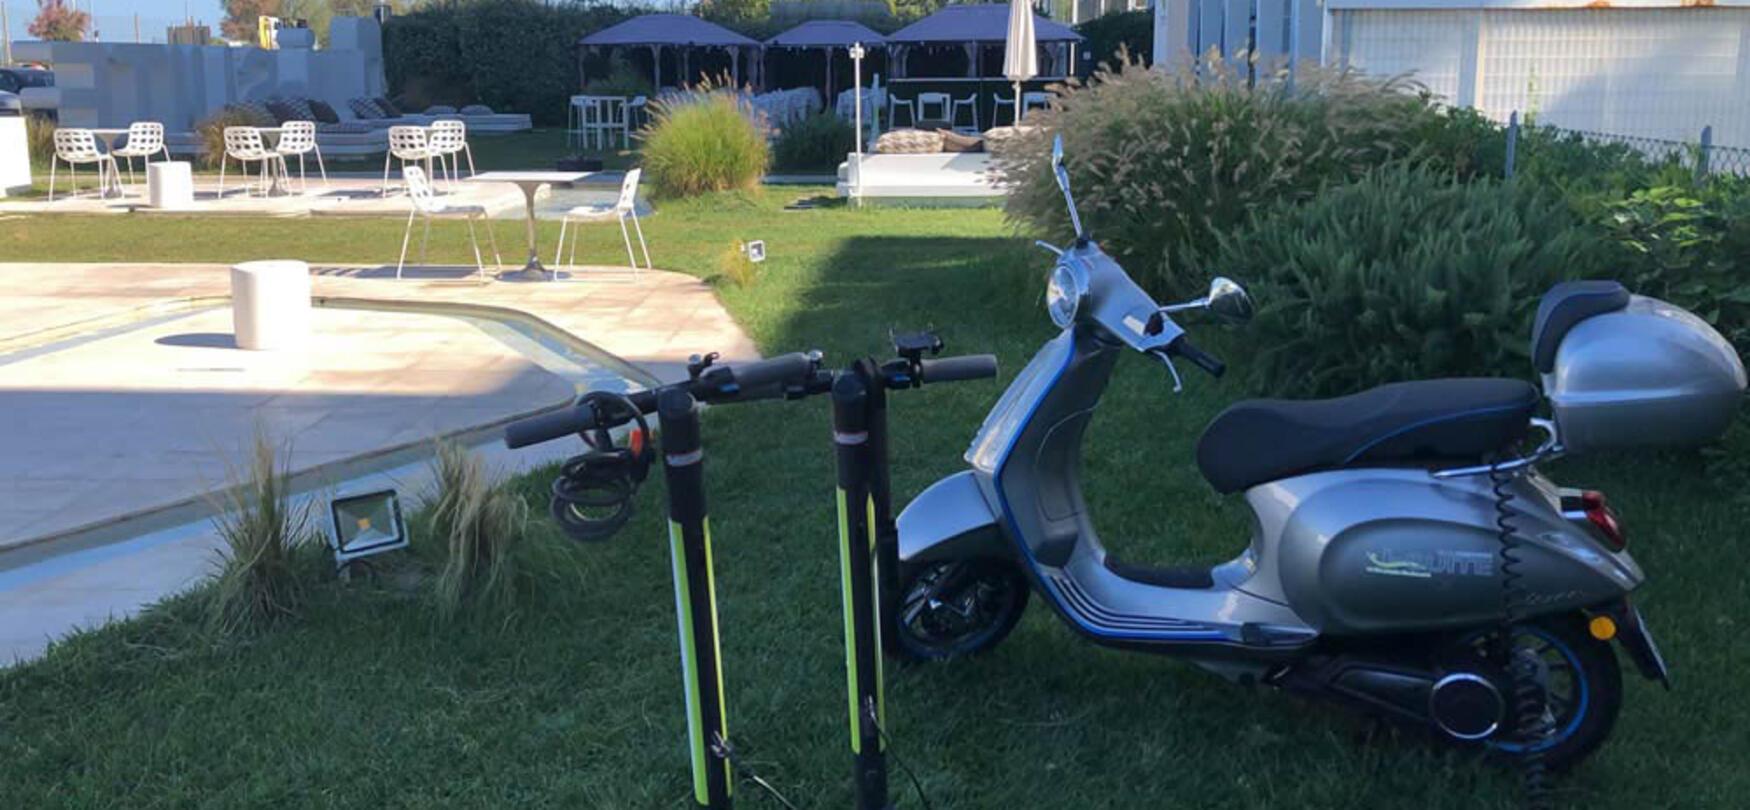 ambienthotels en electric-vehicle-rental-rimini 008